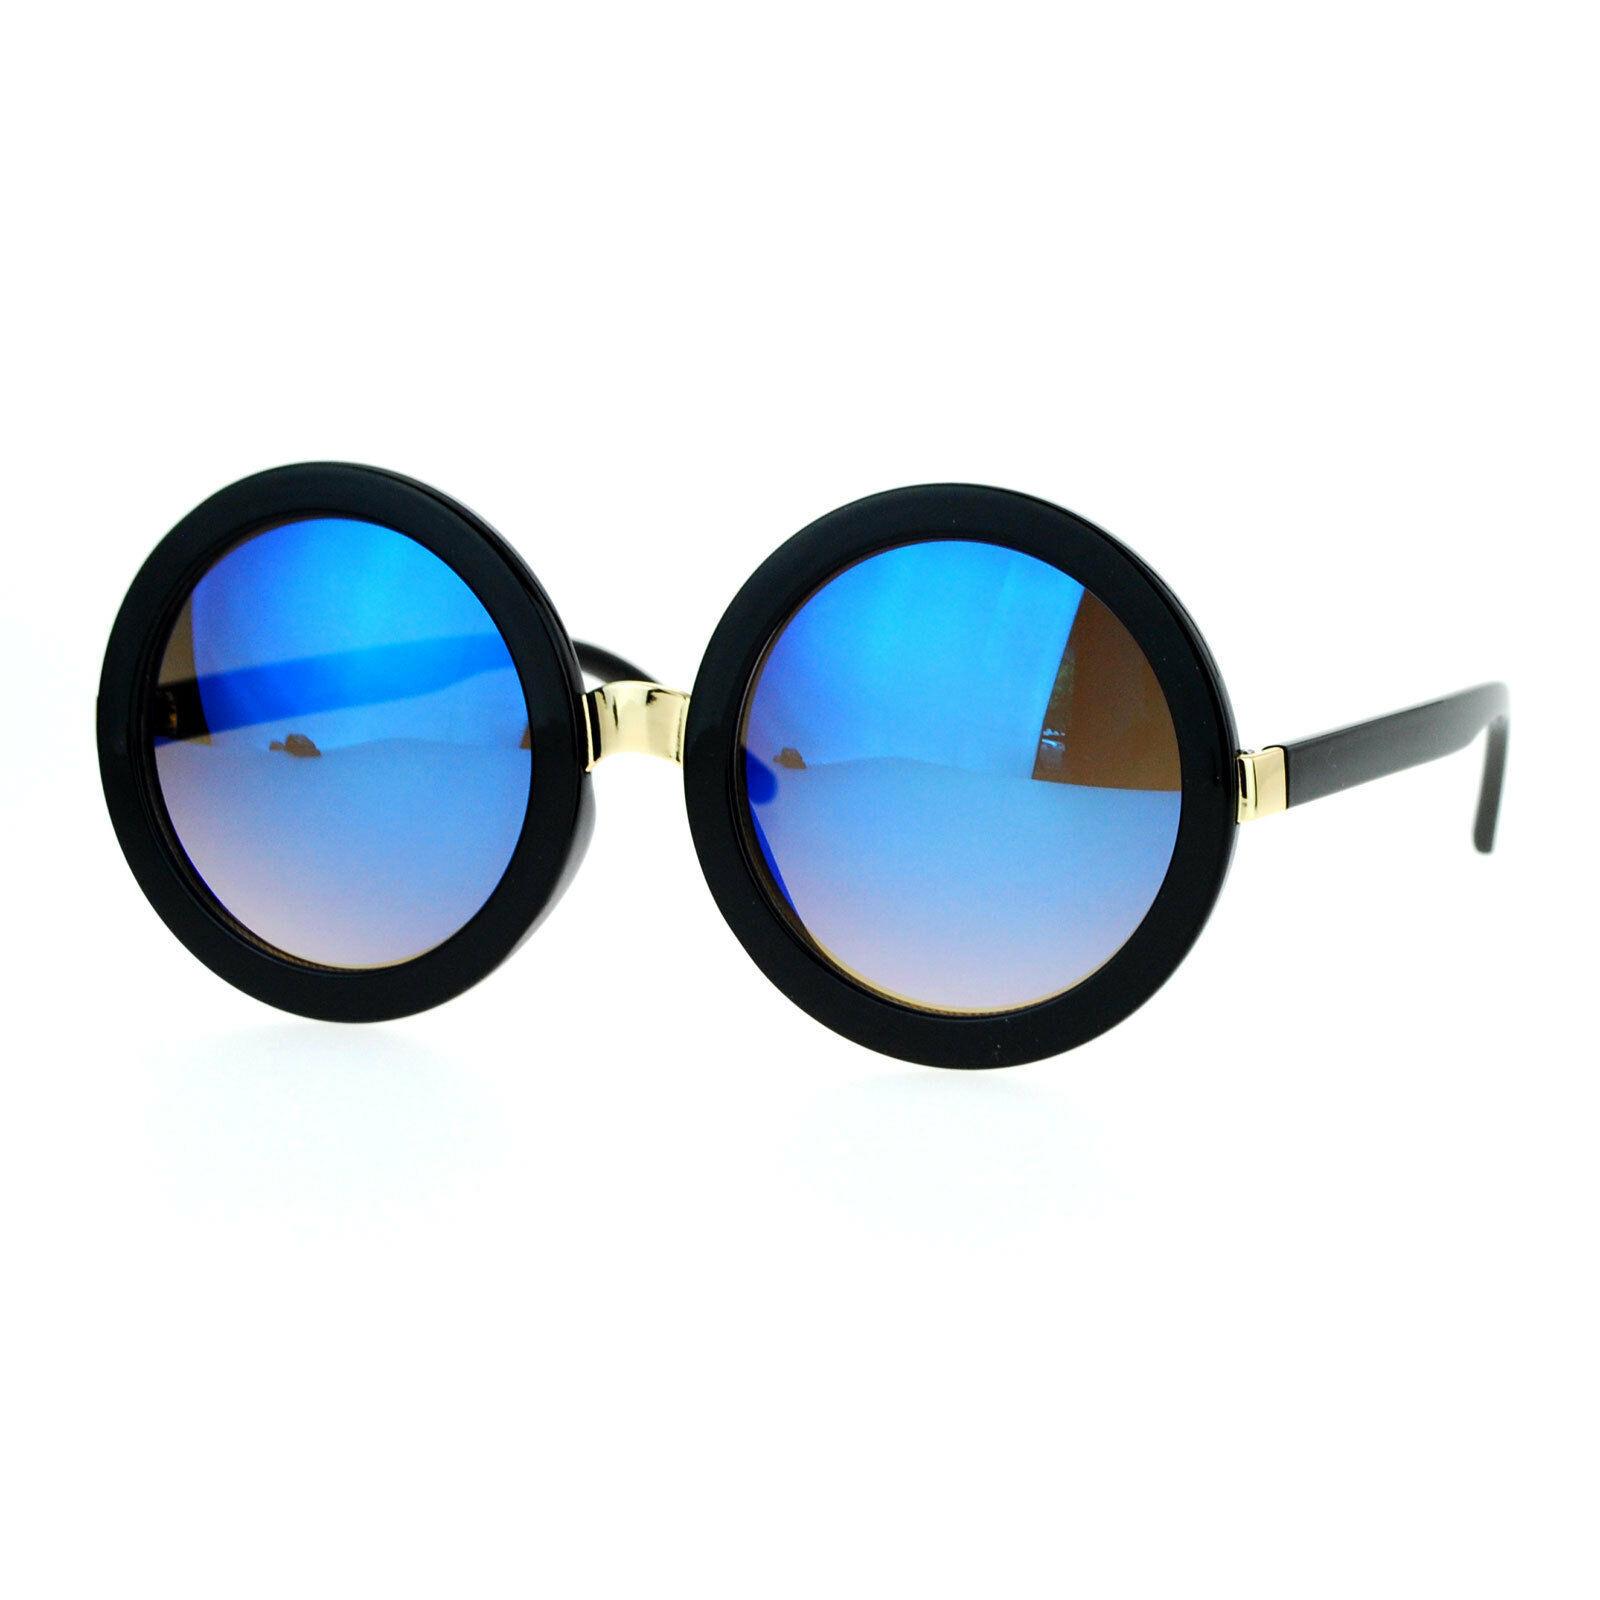 Womens Oversized Fashion Sunglasses Round Circle Frame Mirror Lens